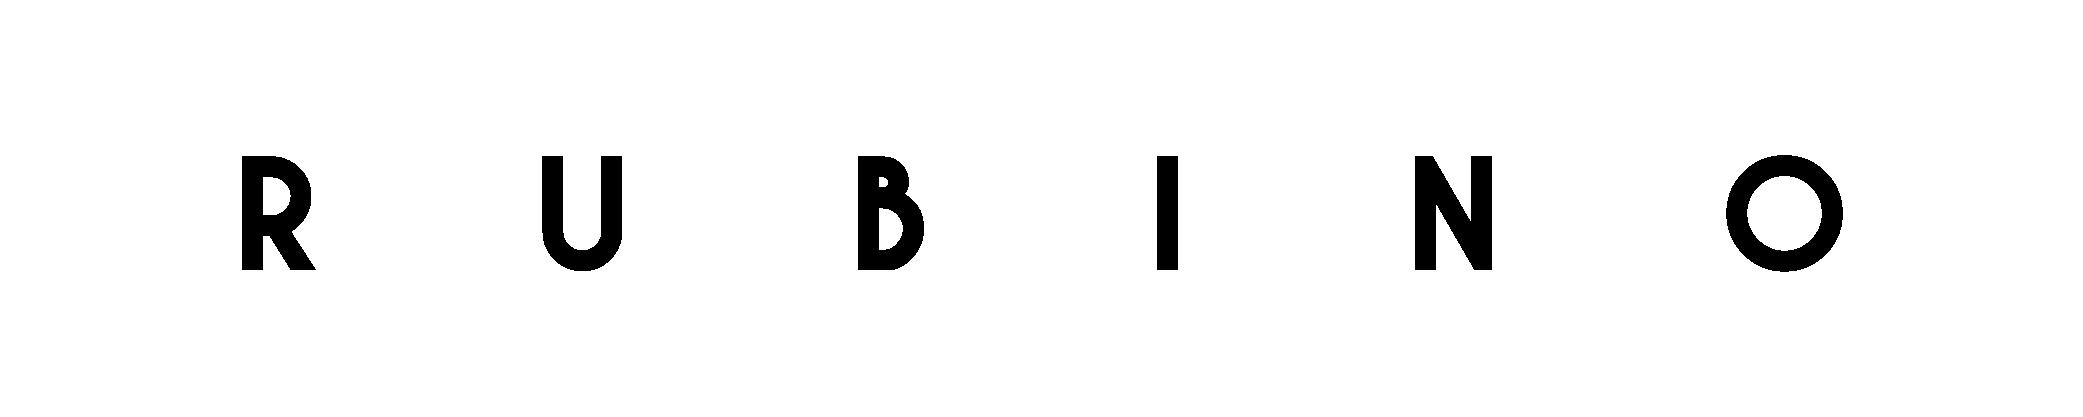 Rubino | Tessuti per l'arredamento Logo